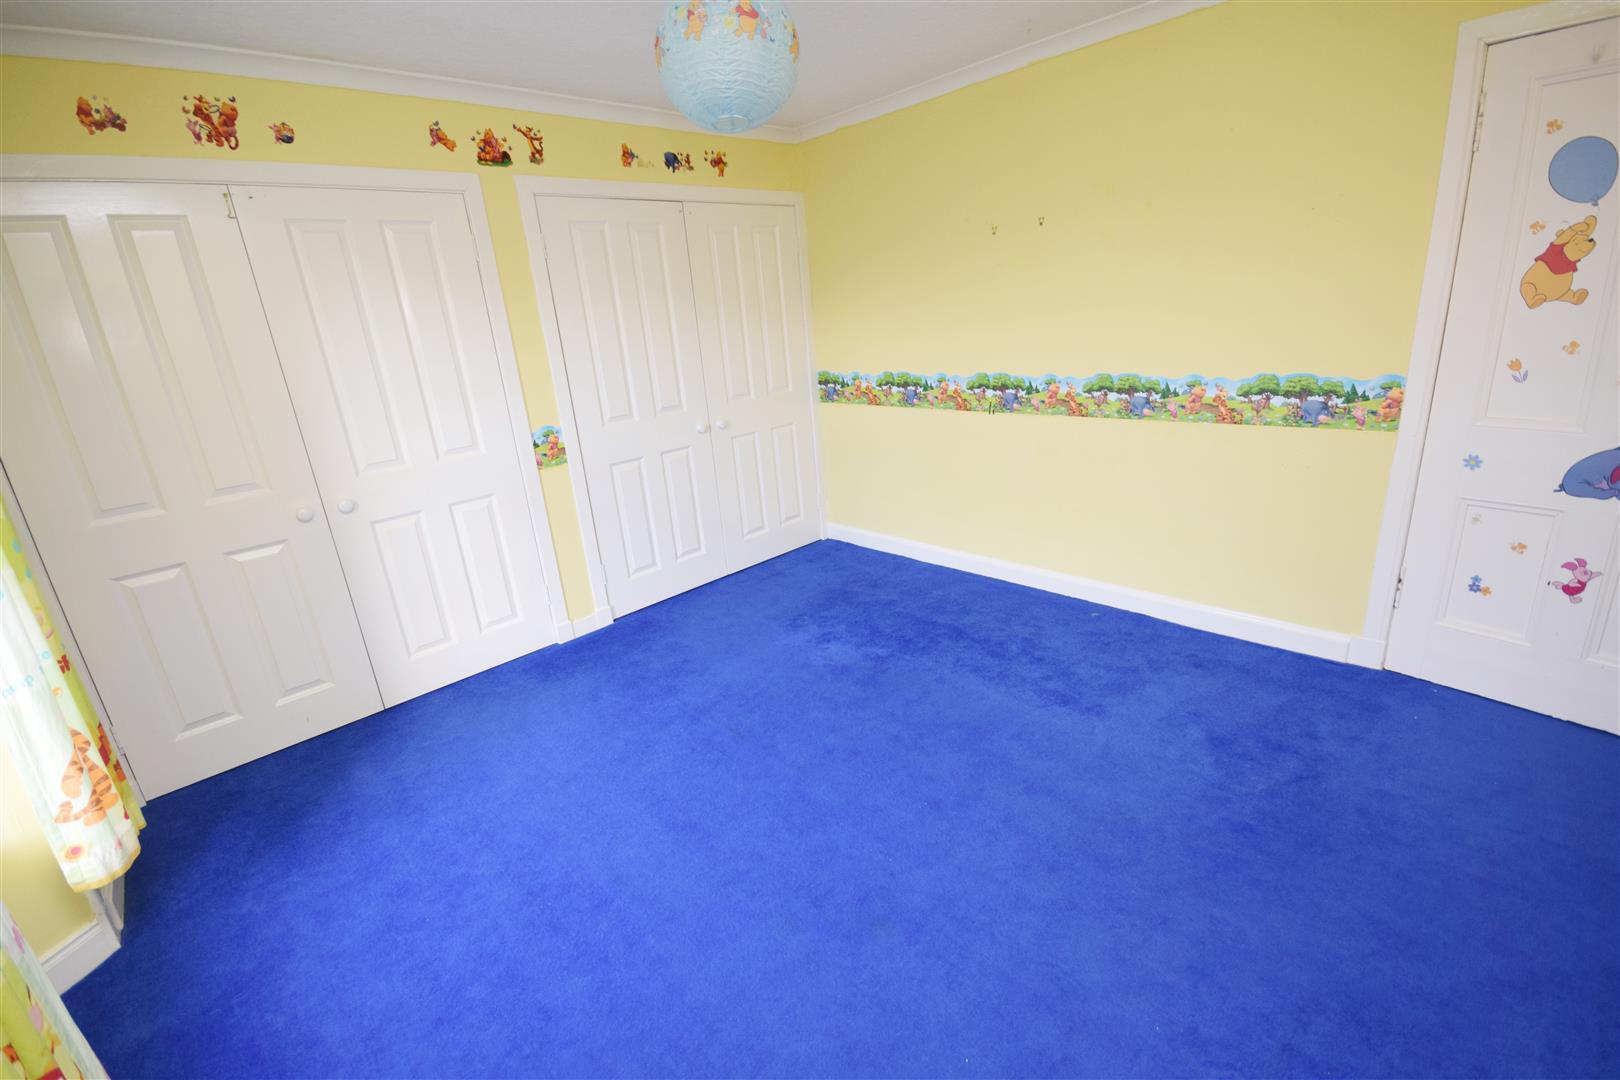 Tinkerbells Cottage, 58, Perth Road, Scone, PERTH, PH2 6JL, UK